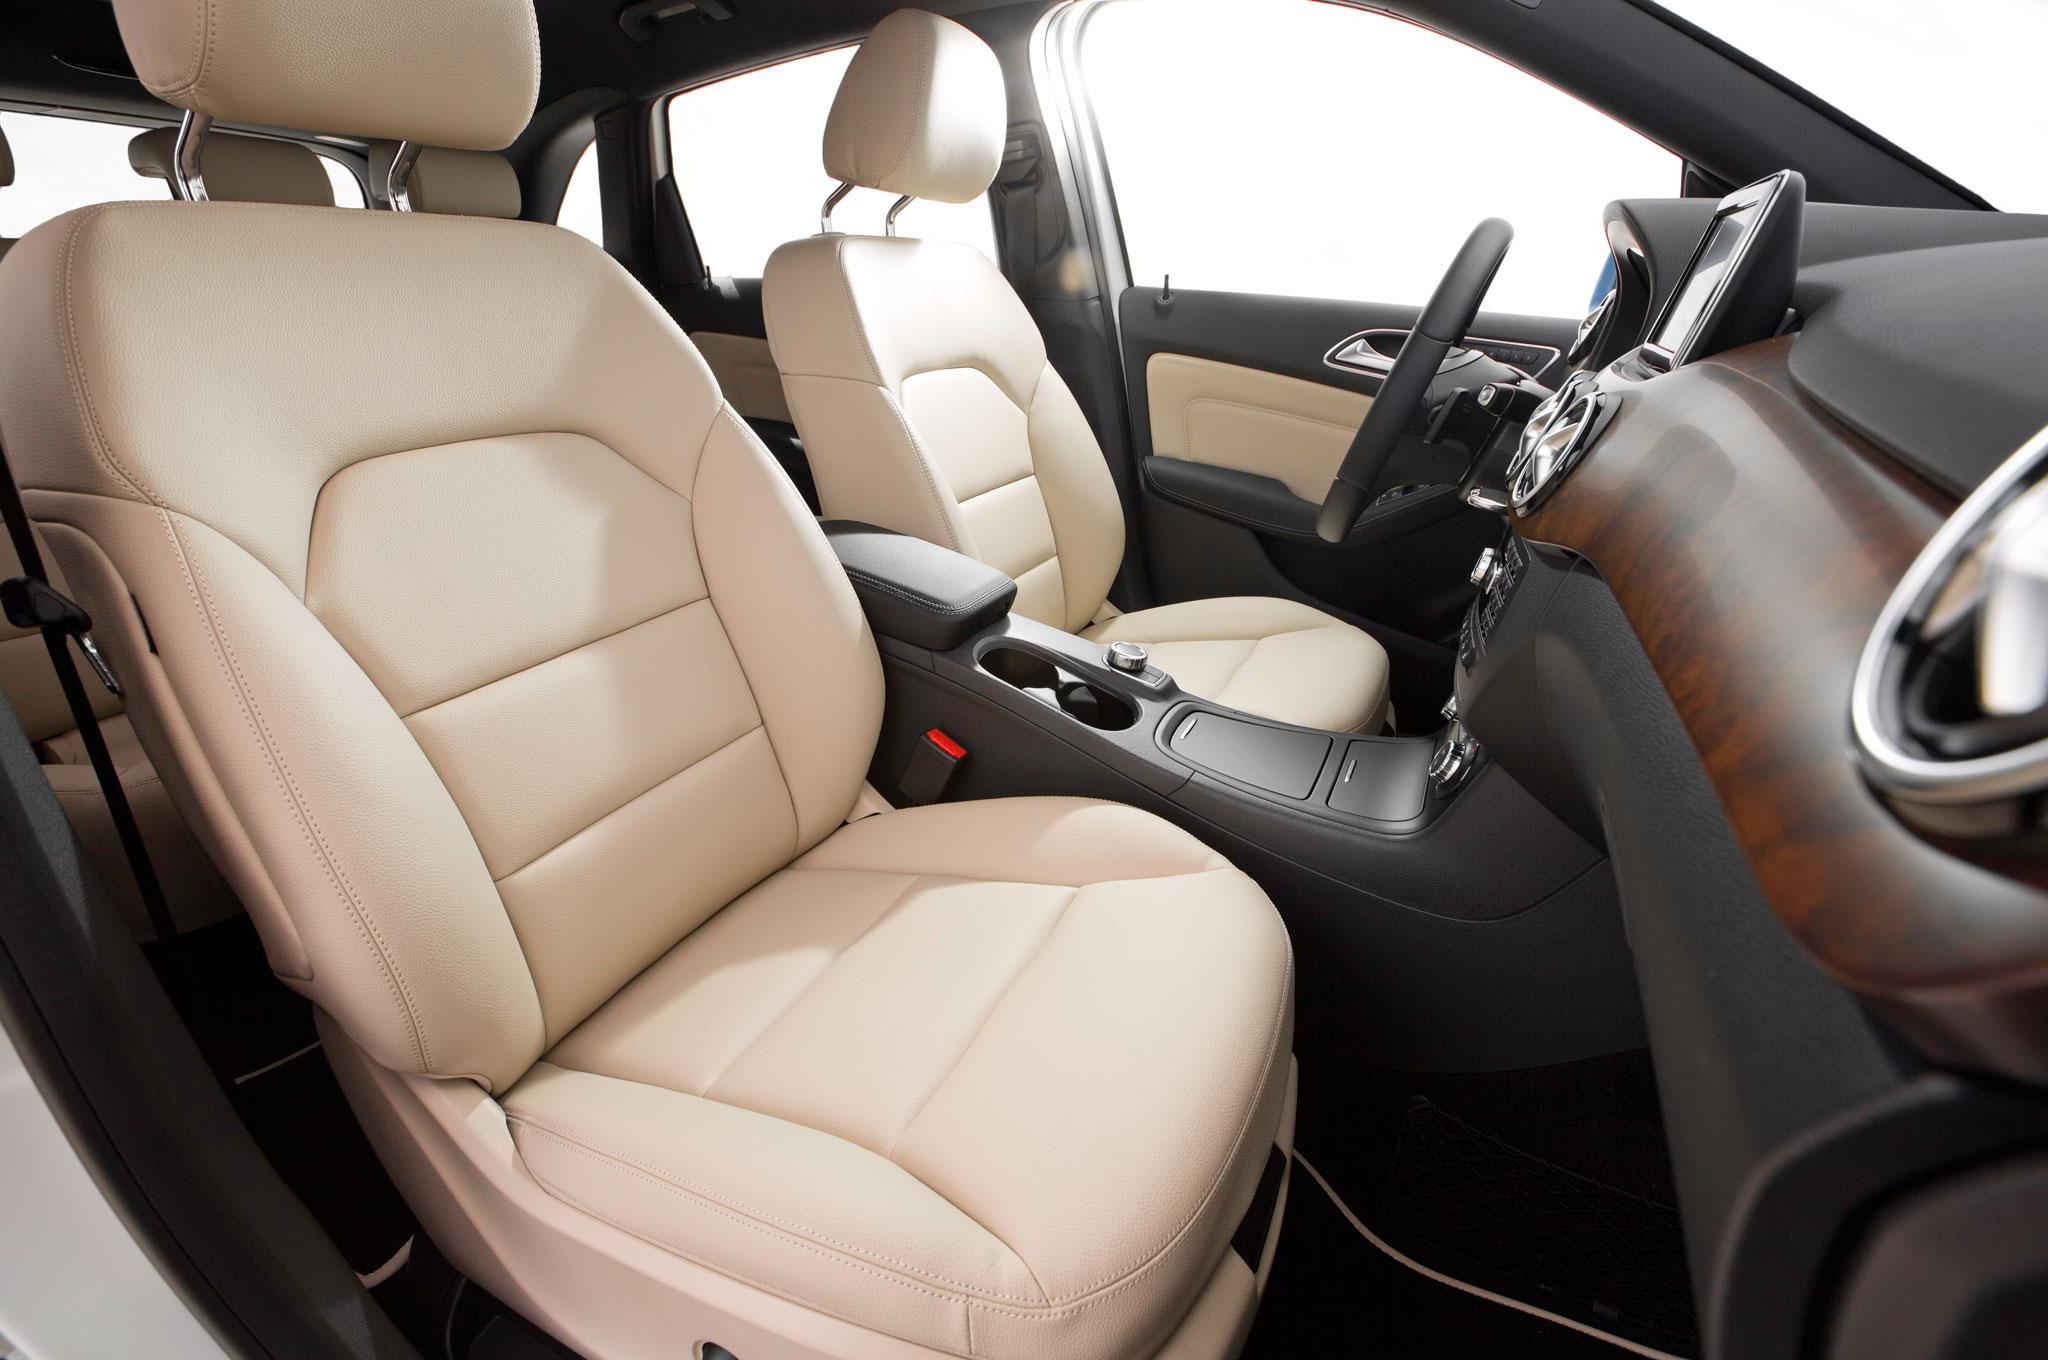 2014 mercedes benz b class electric drive review automobile magazine. Black Bedroom Furniture Sets. Home Design Ideas